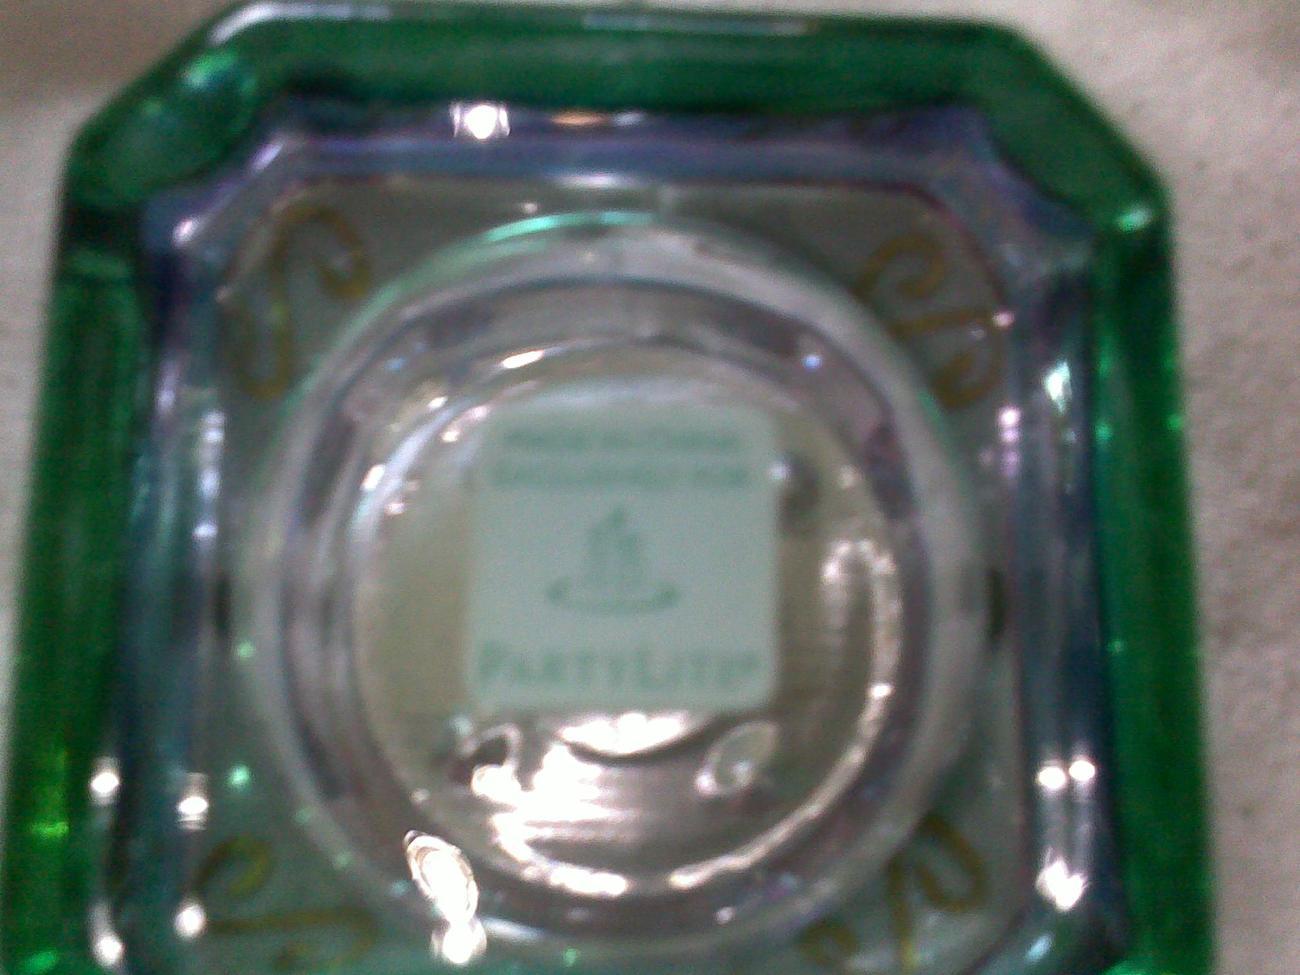 PARTYLITE  MARDI GRAS VOTIVE TEA LIGHT GLASS CANDLE HOLDER - SET OF 2